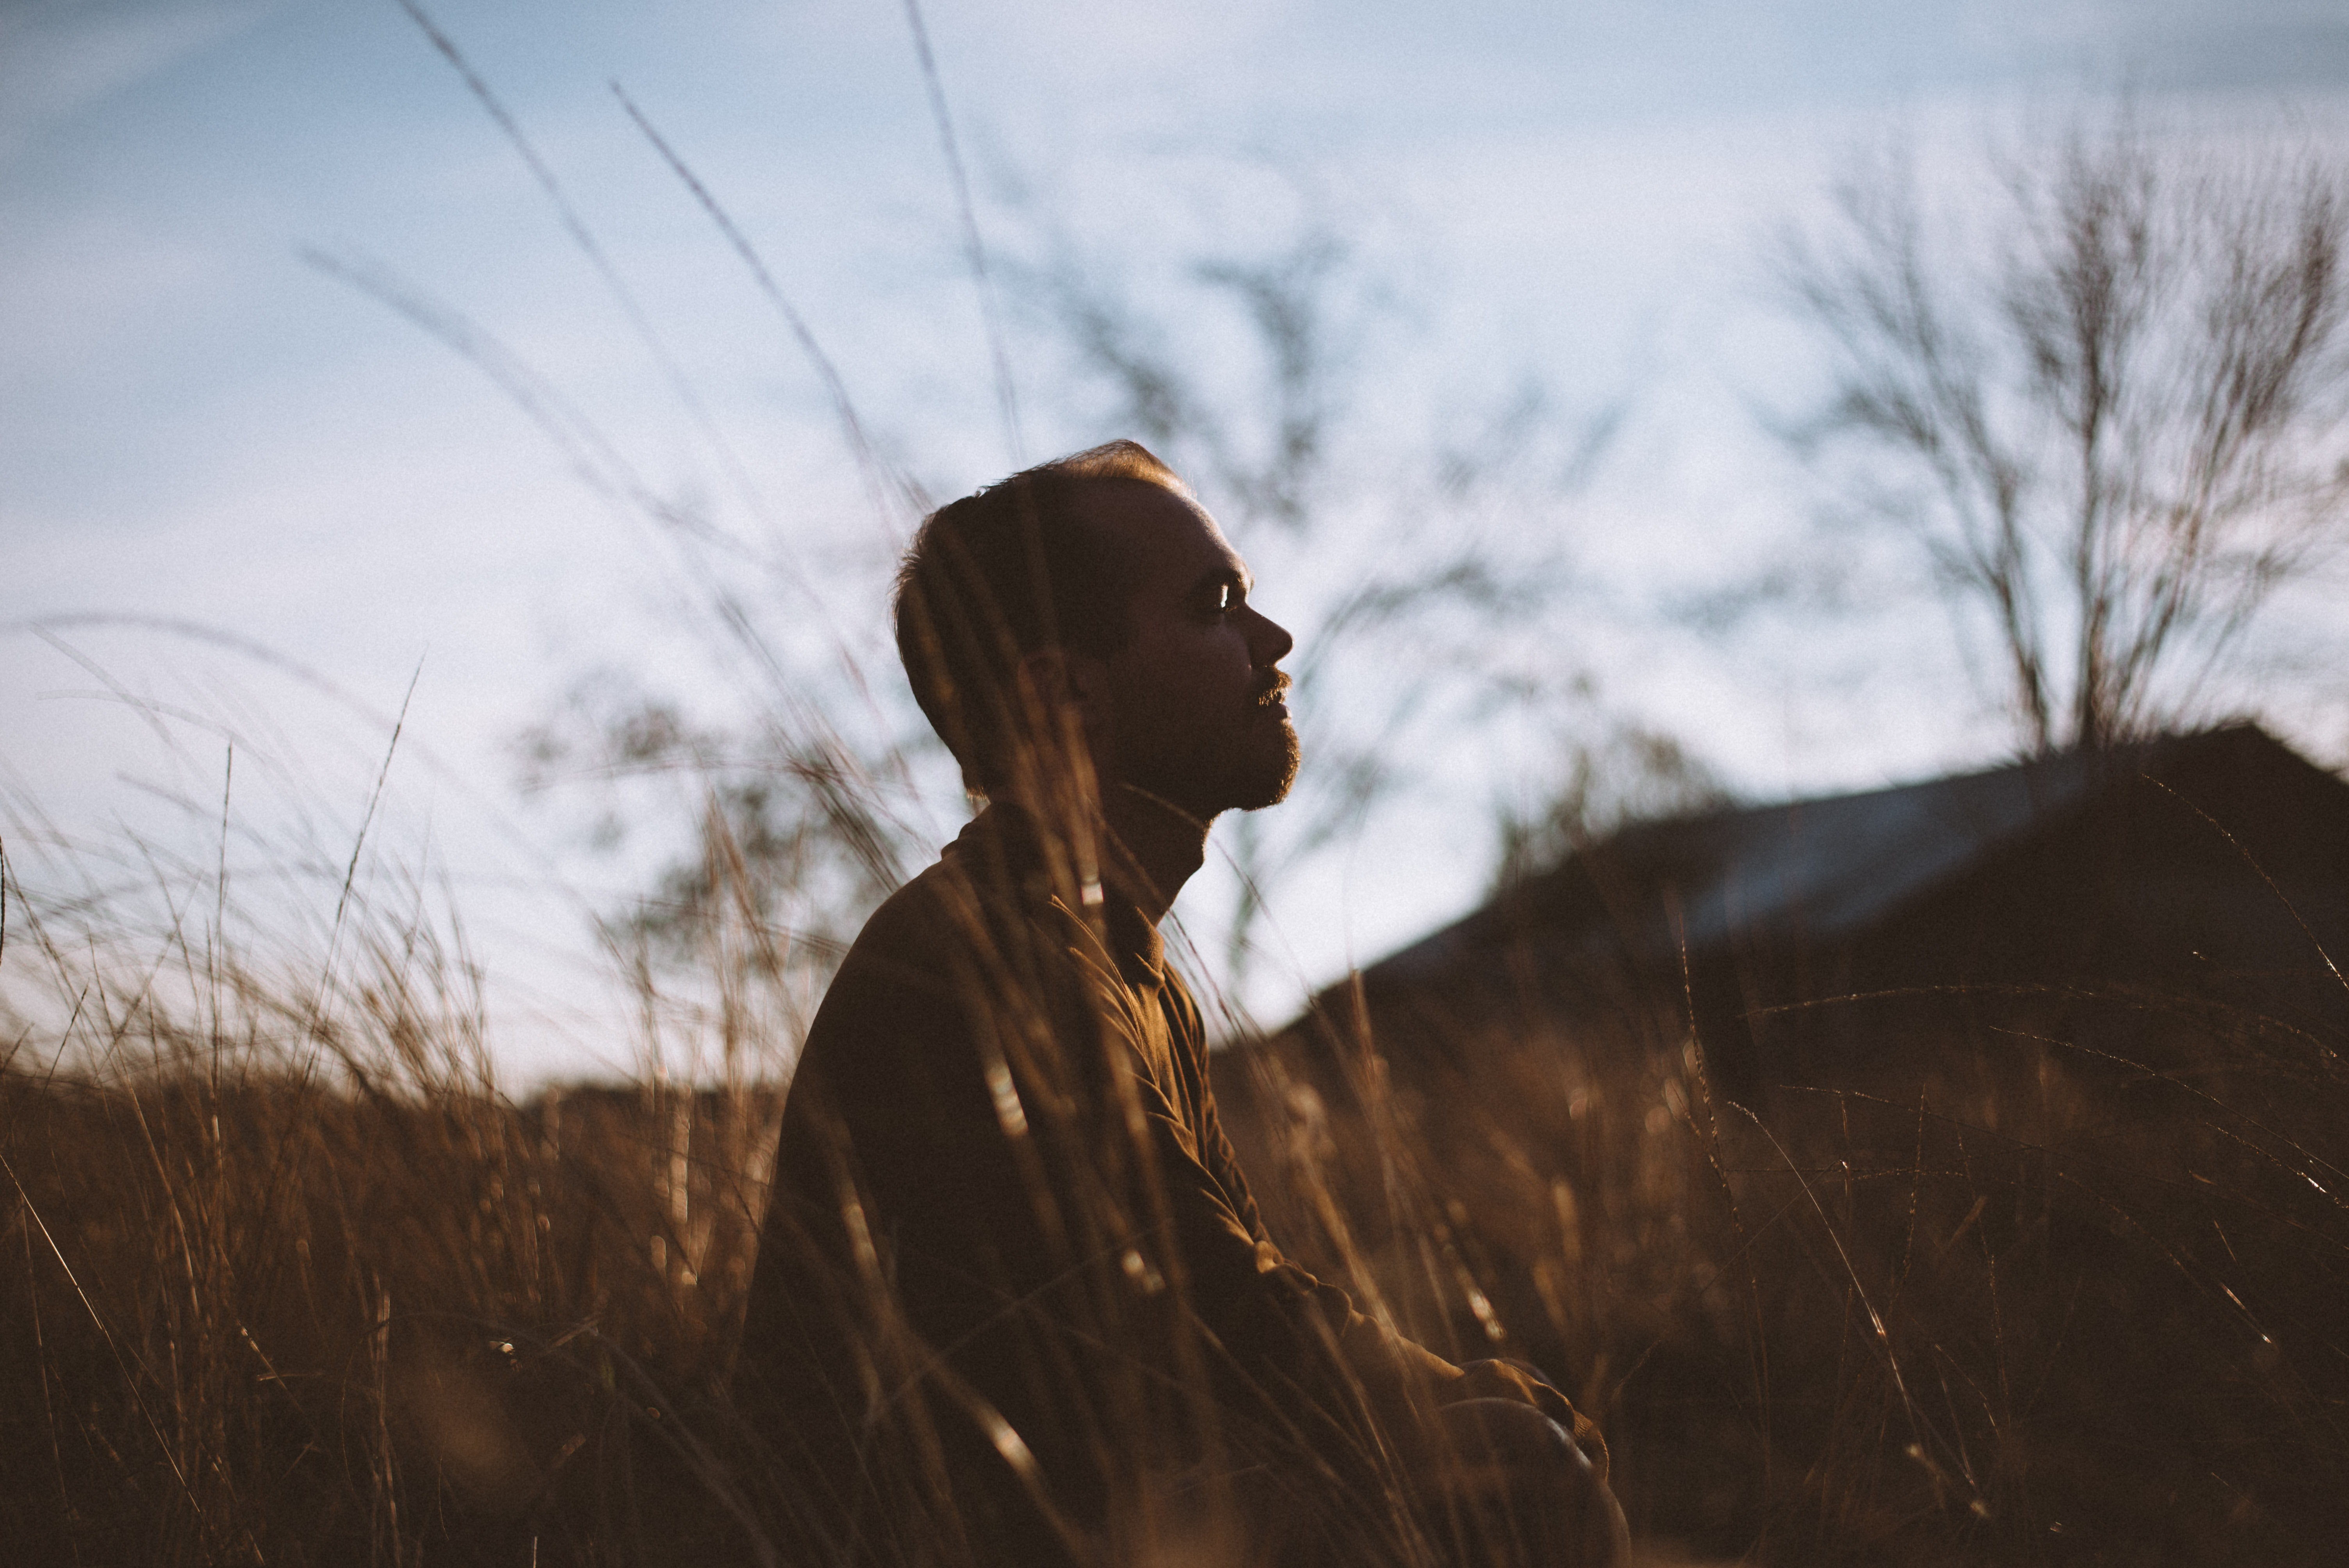 Mindfulness Meditate Relajación Relax Breath